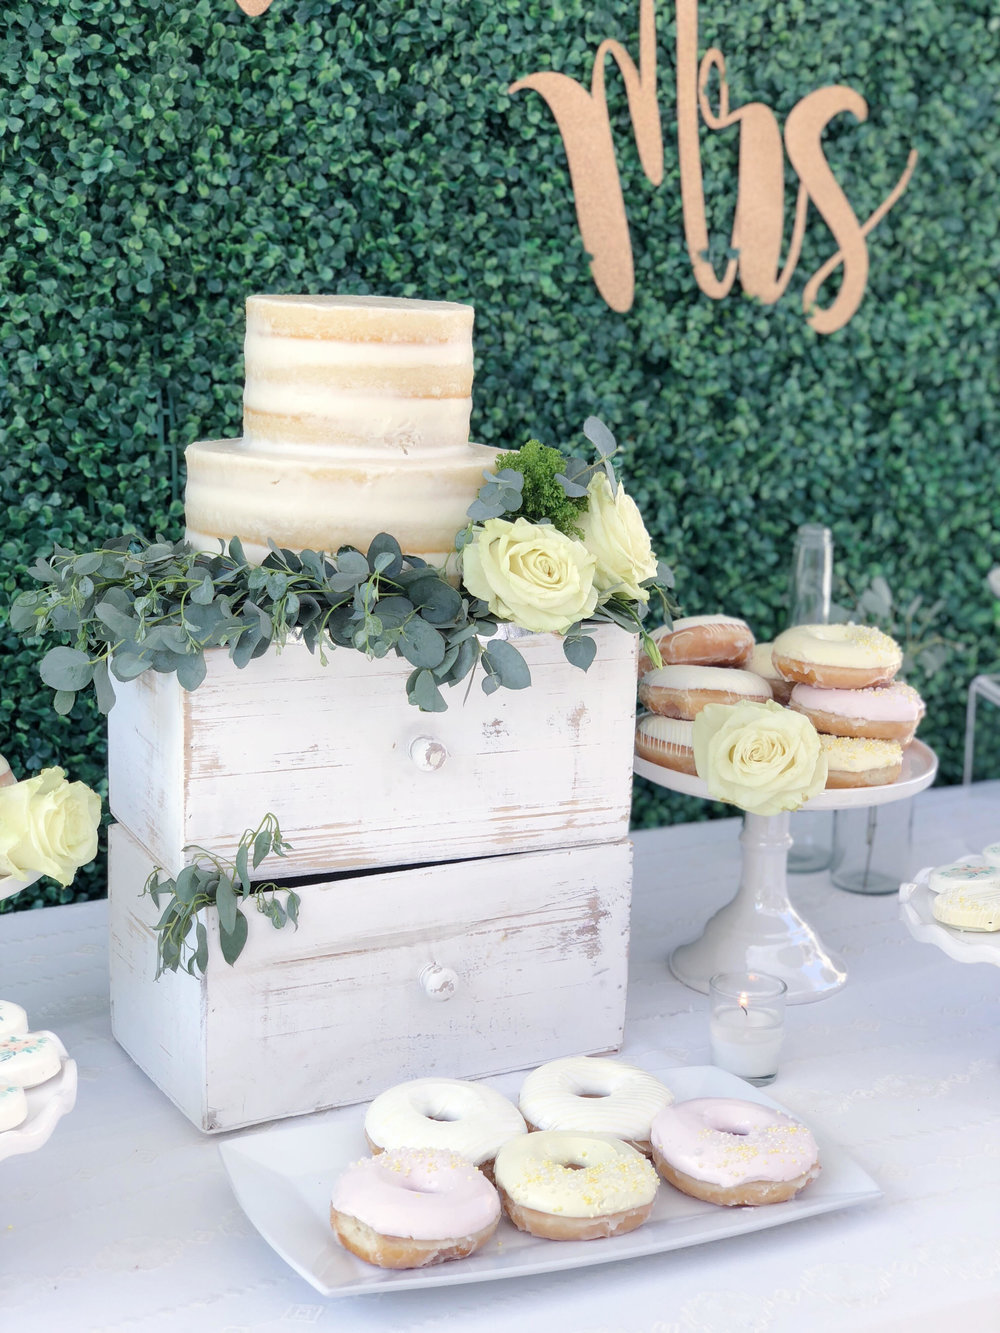 Bridal Shower Cake-Garden Bridal Shower-Bridal-www.sugarpartiesla.com.jpg